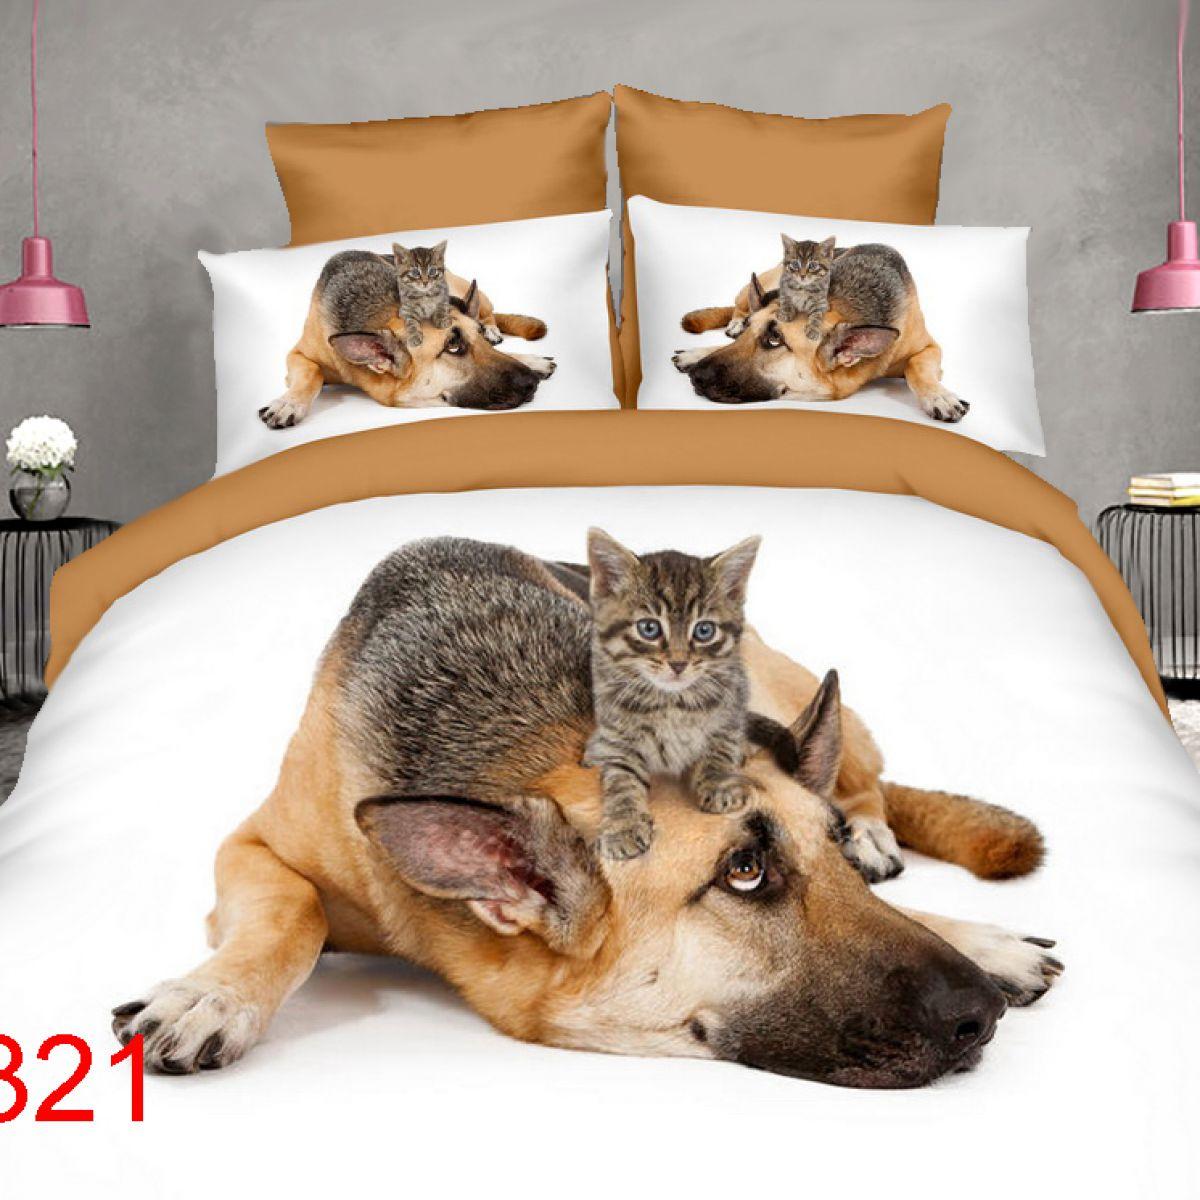 3D Beddings - Antonio - AML-321 - 160x200 cm - 4 pcs